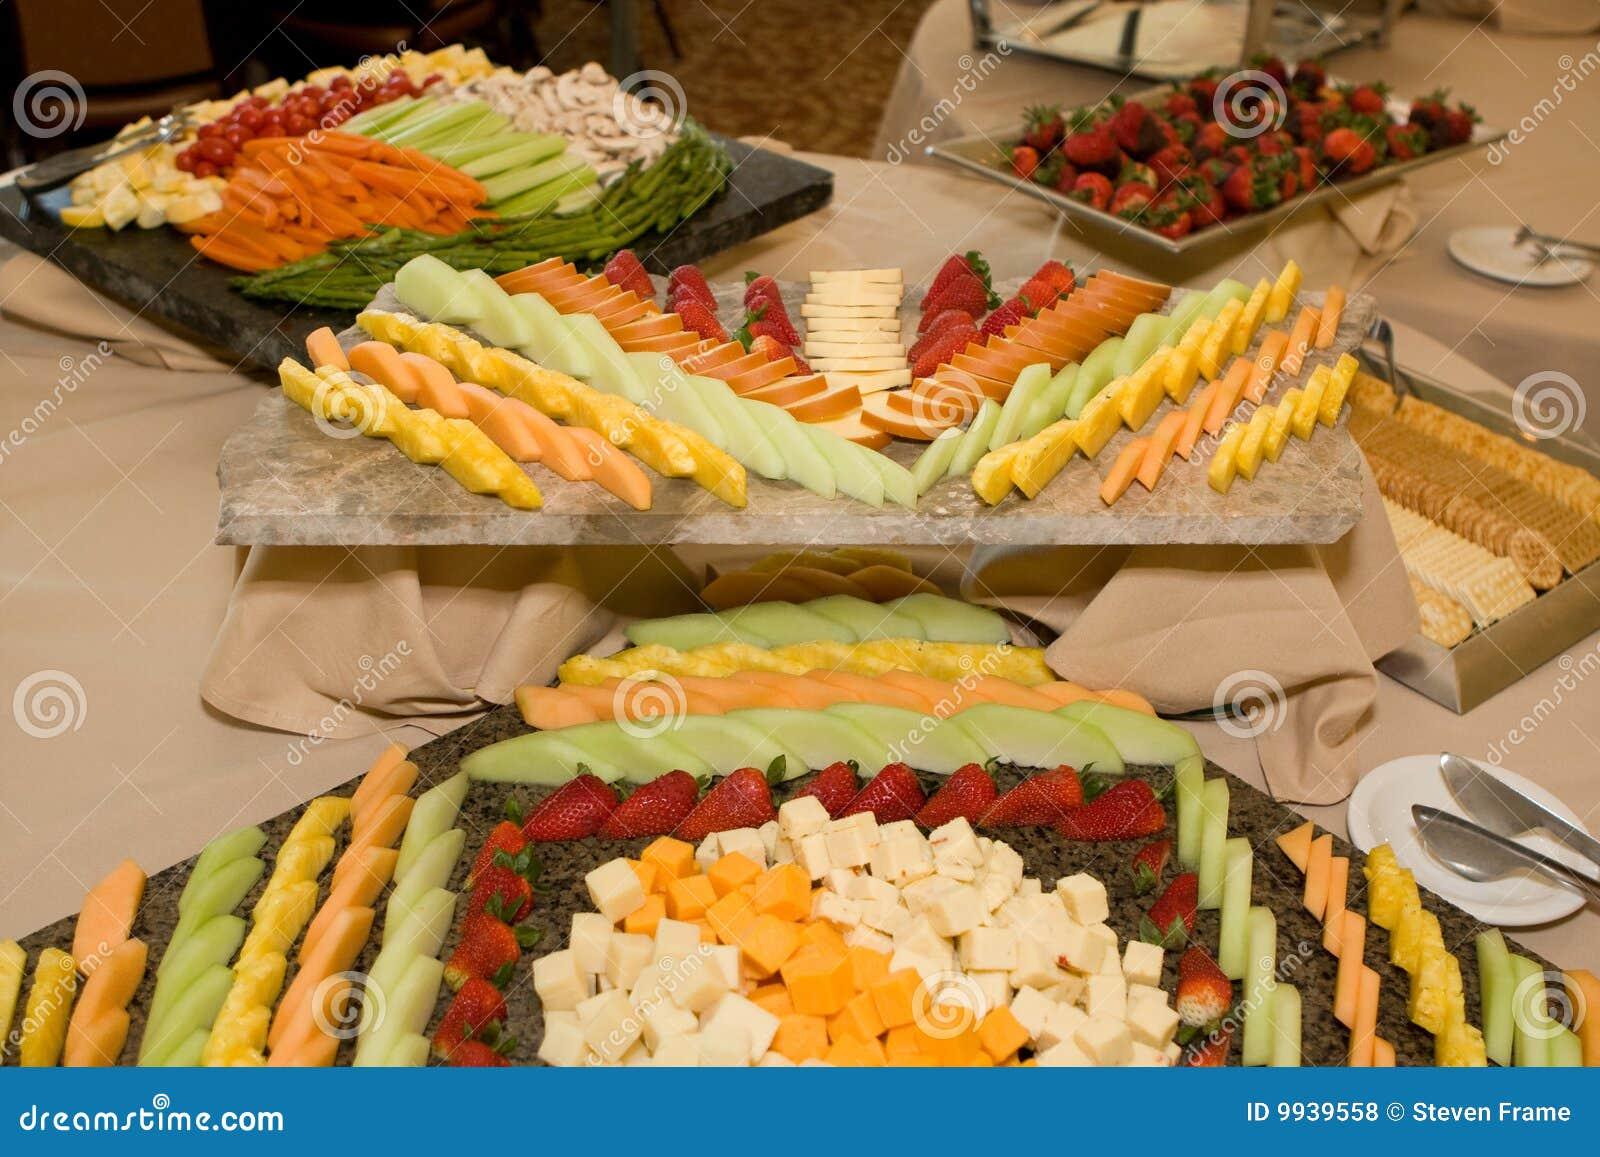 Fruit Cheese Tray Royalty Free Stock Photos Image 9939558